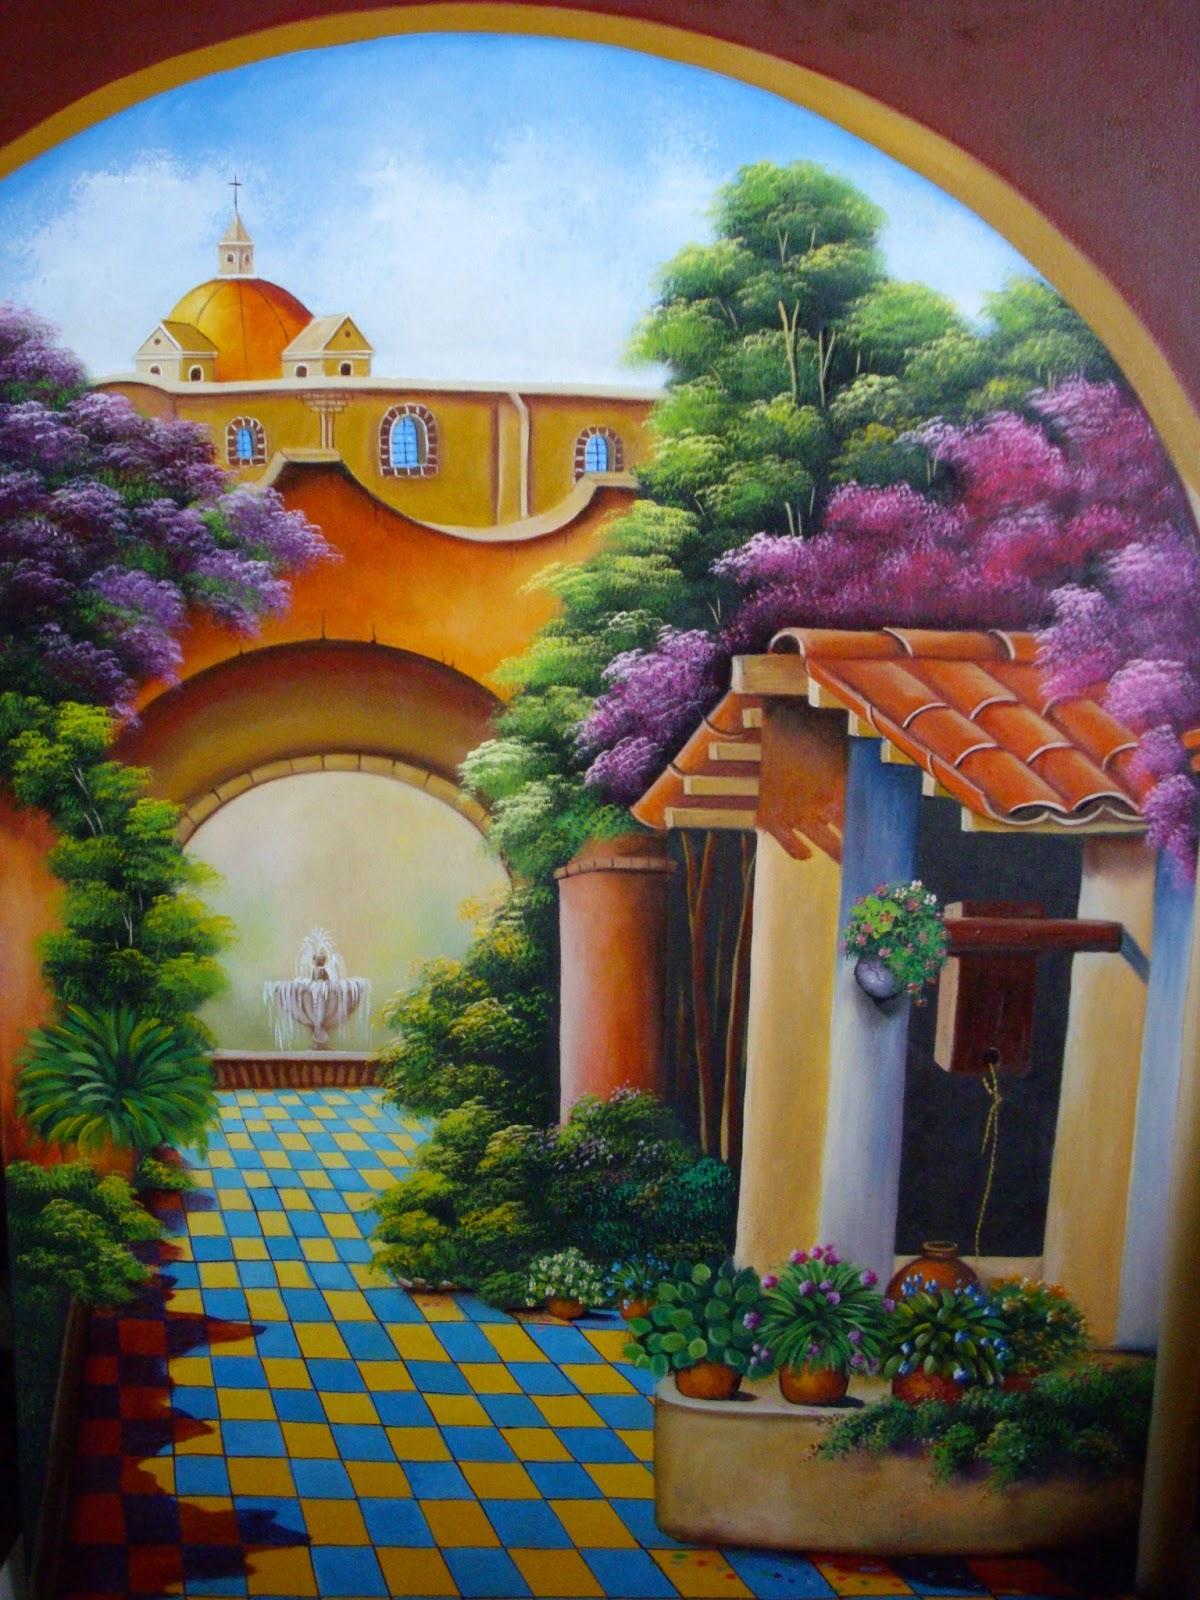 Pintura moderna y fotograf a art stica cuadros de arte - Cuadros murales para pared ...